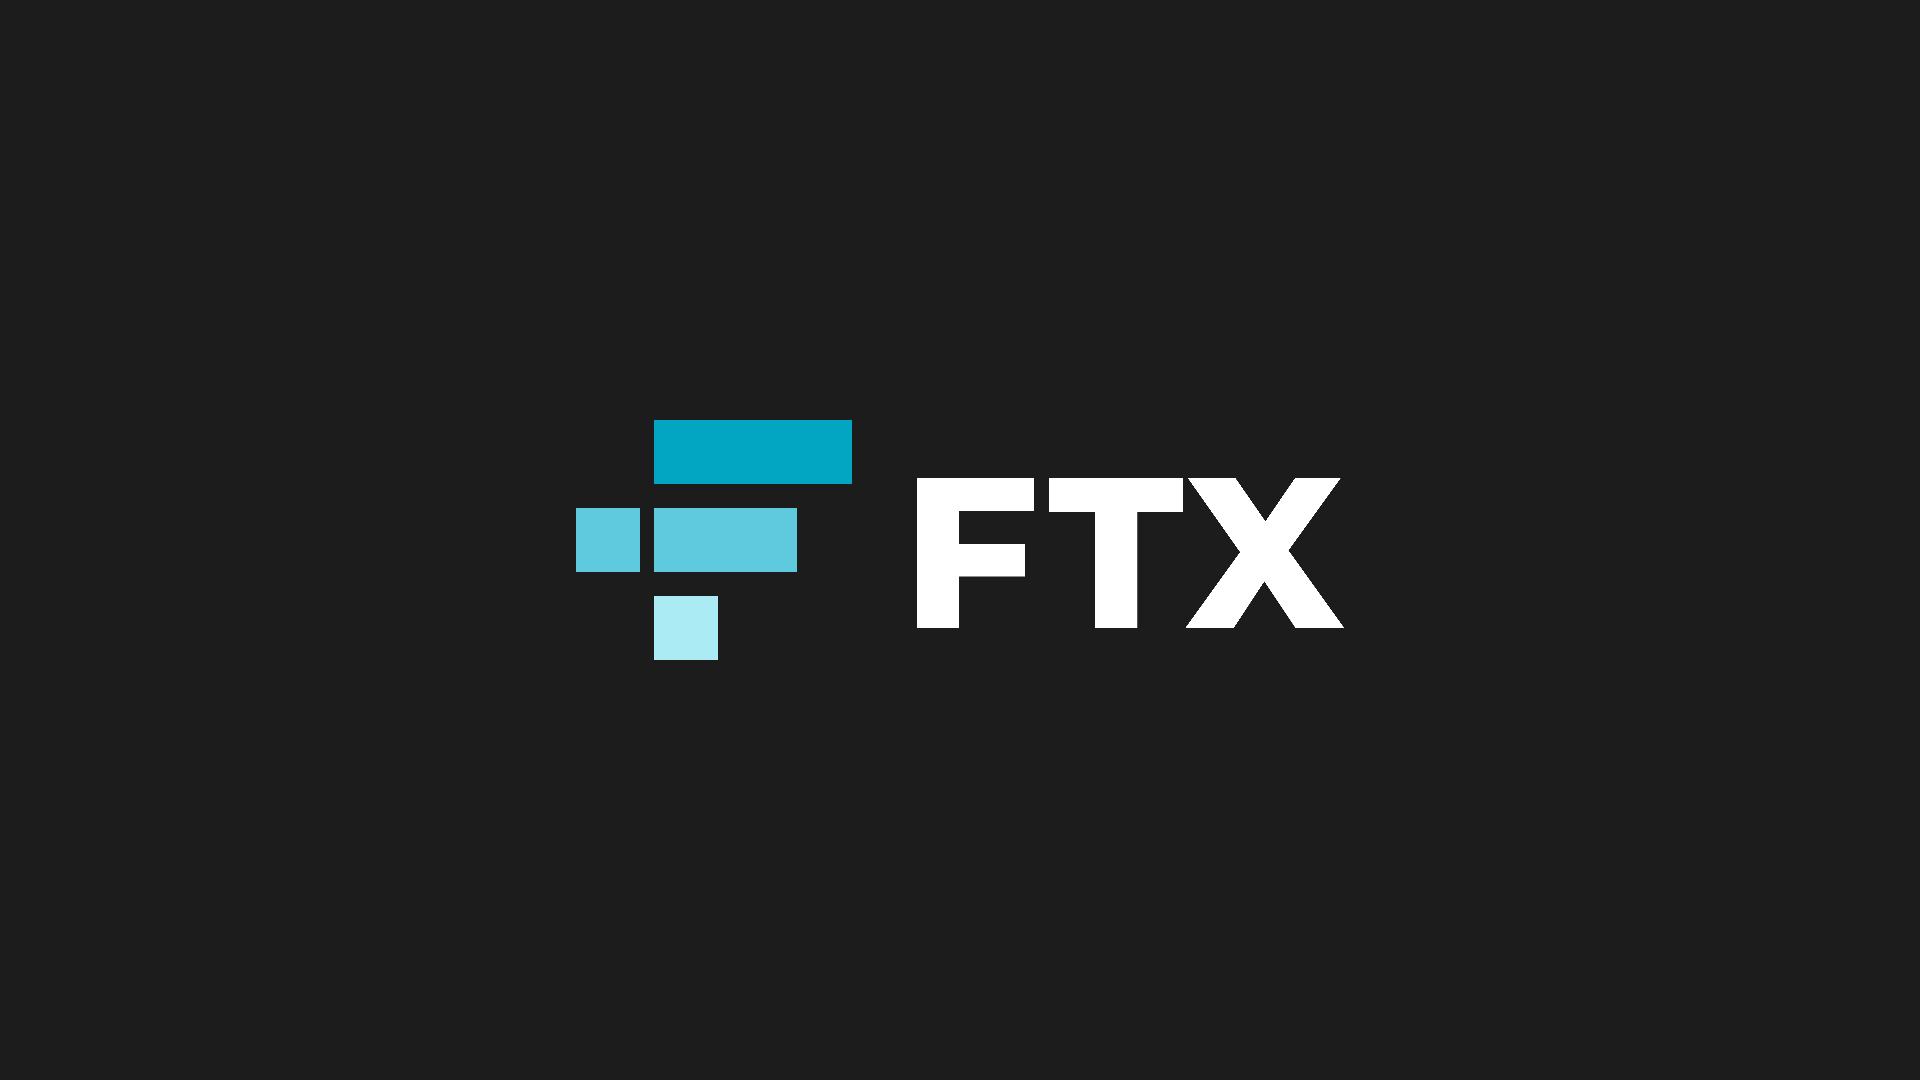 Crypto exchange FTX inks exclusive partnership with the Miami Heat